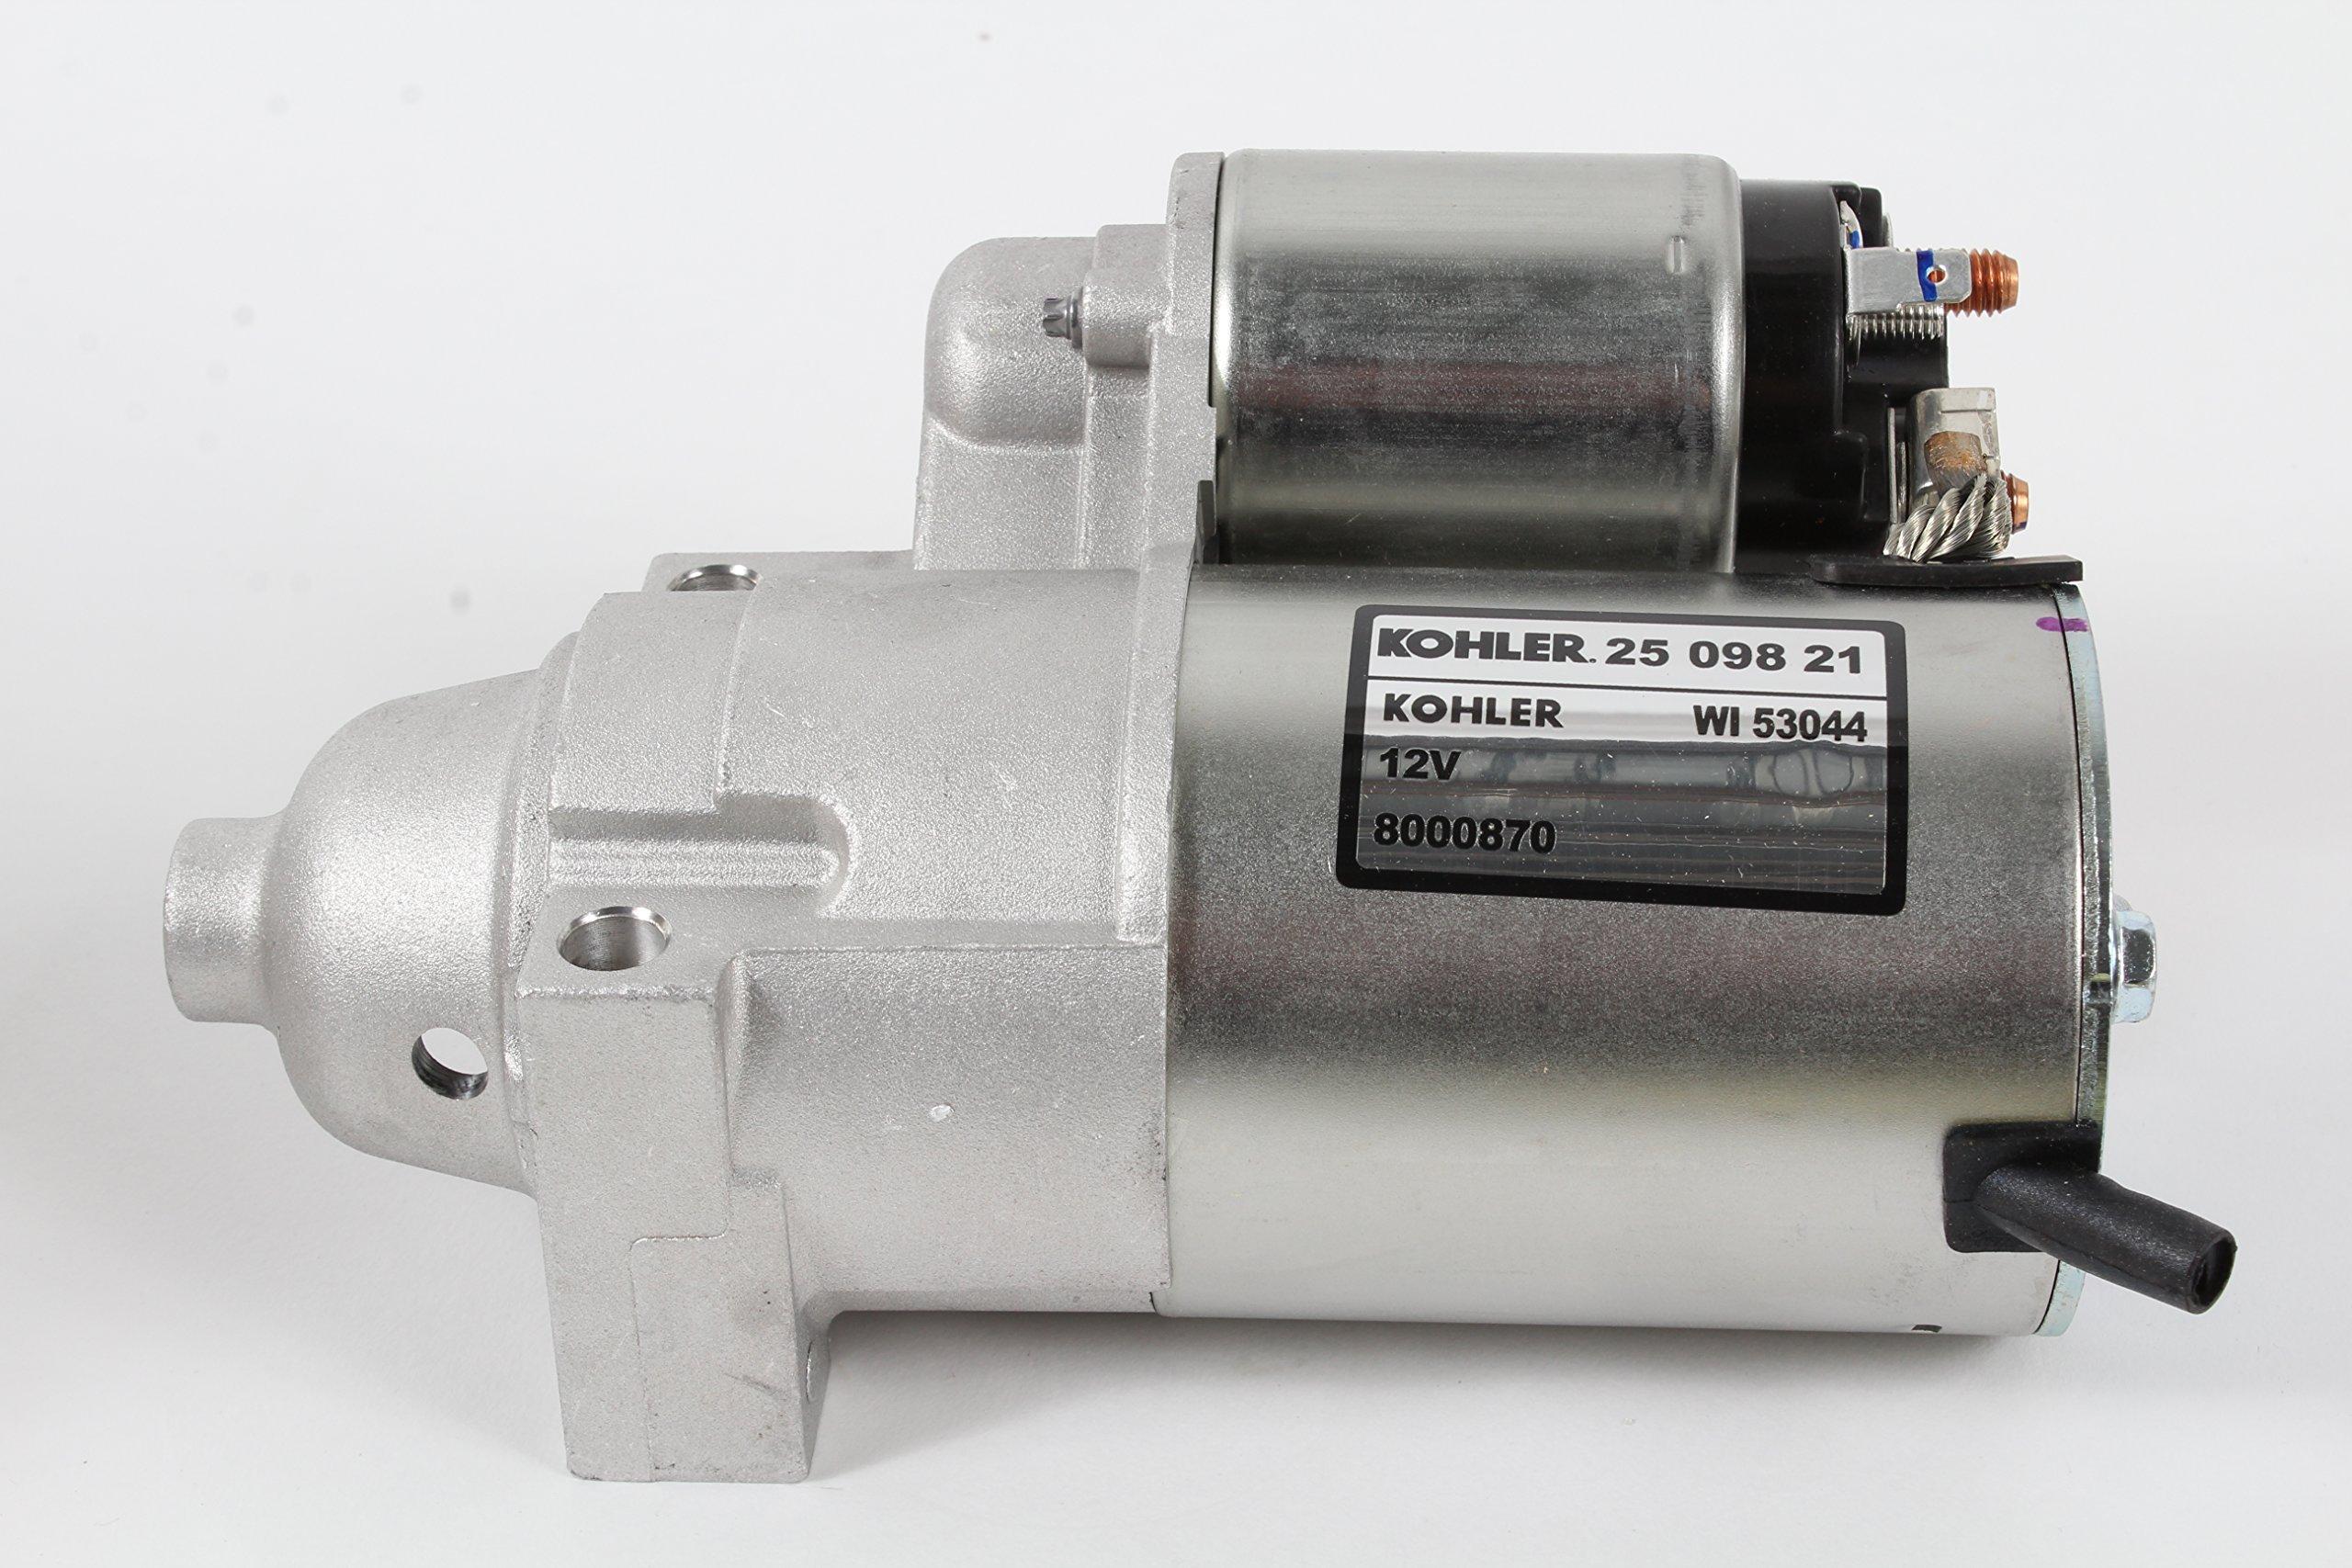 Kohler Co. 25-098-21-S Lawn & Garden Equipment Engine Starter Assembly Genuine Original Equipment Manufacturer (OEM) part